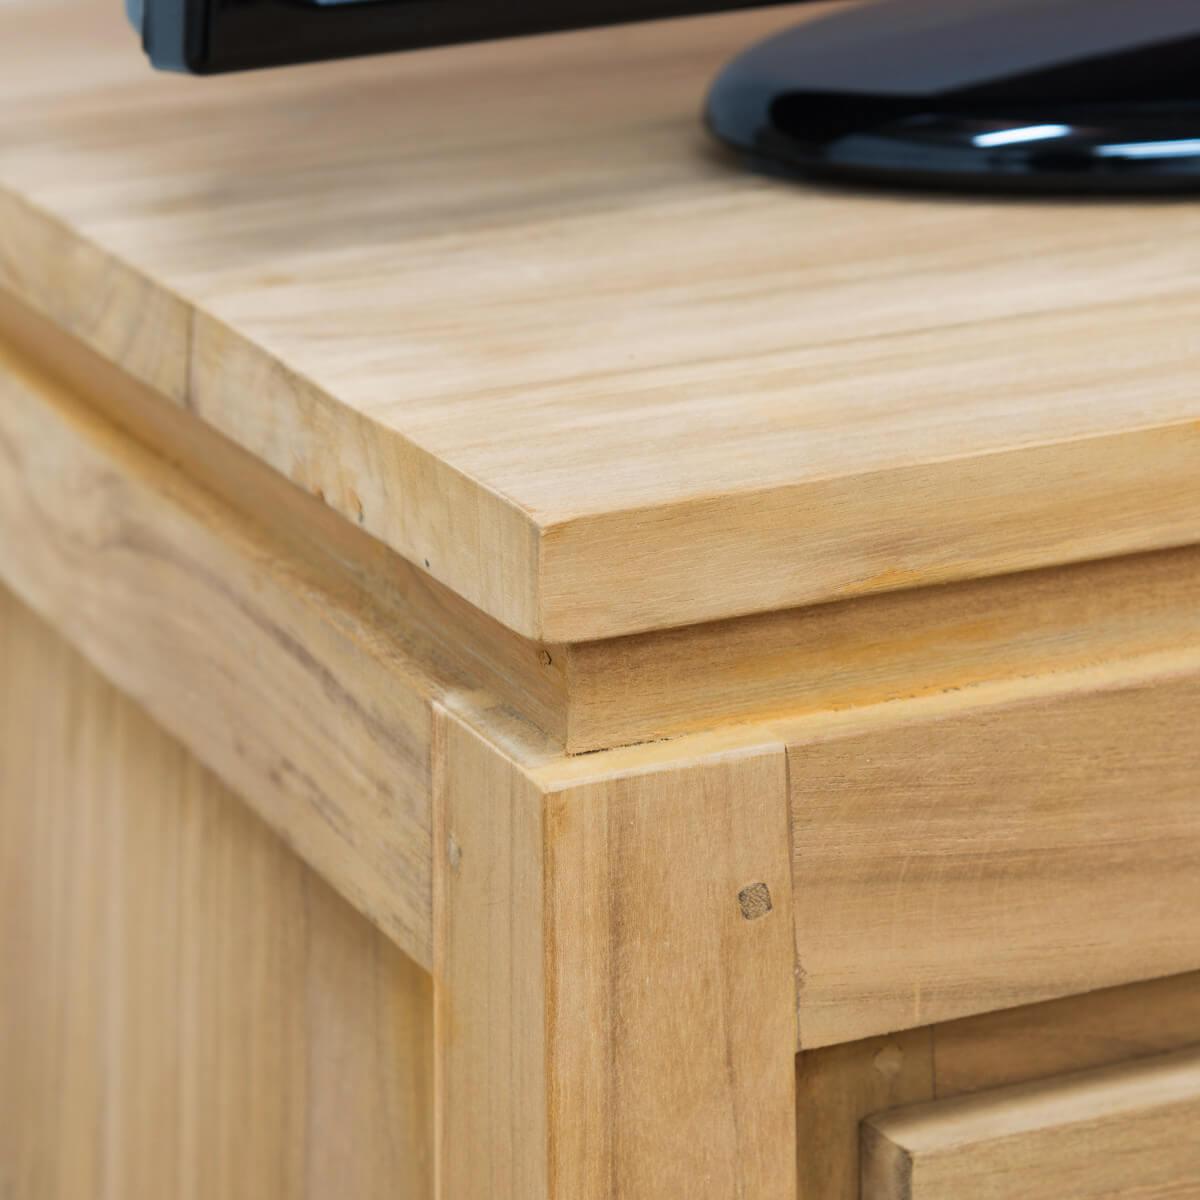 meuble tv teck meuble tv bois naturel rectangle zen. Black Bedroom Furniture Sets. Home Design Ideas